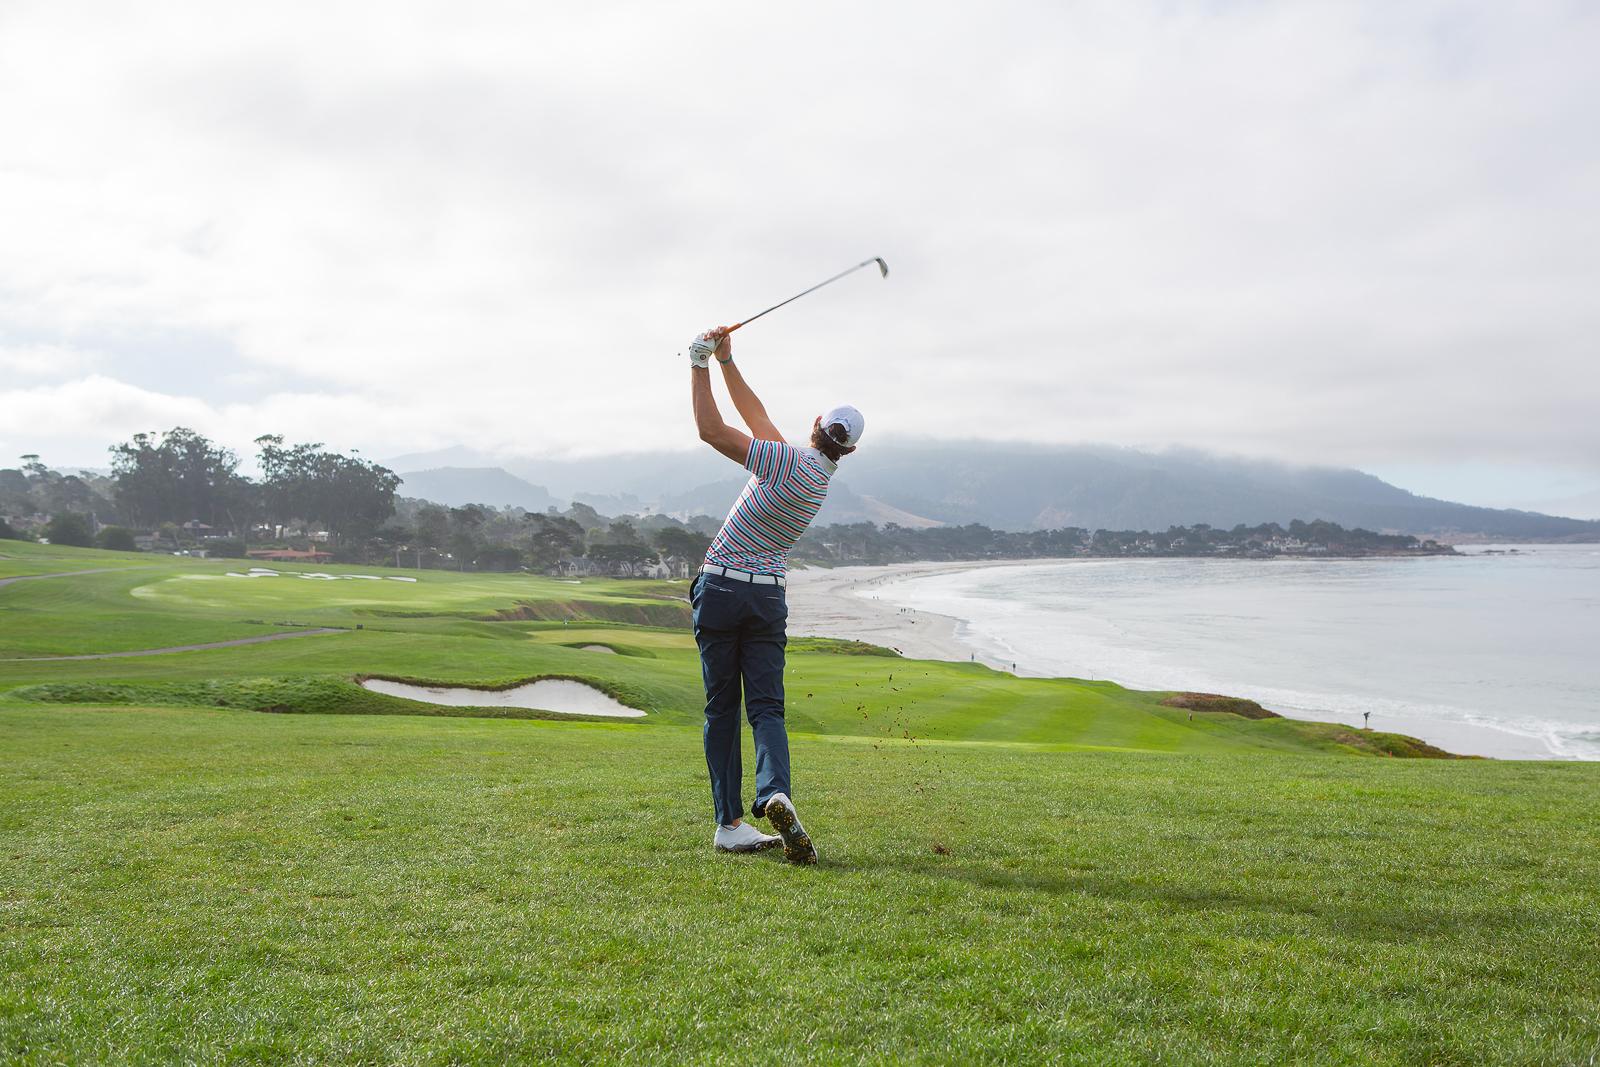 Golf on the coast